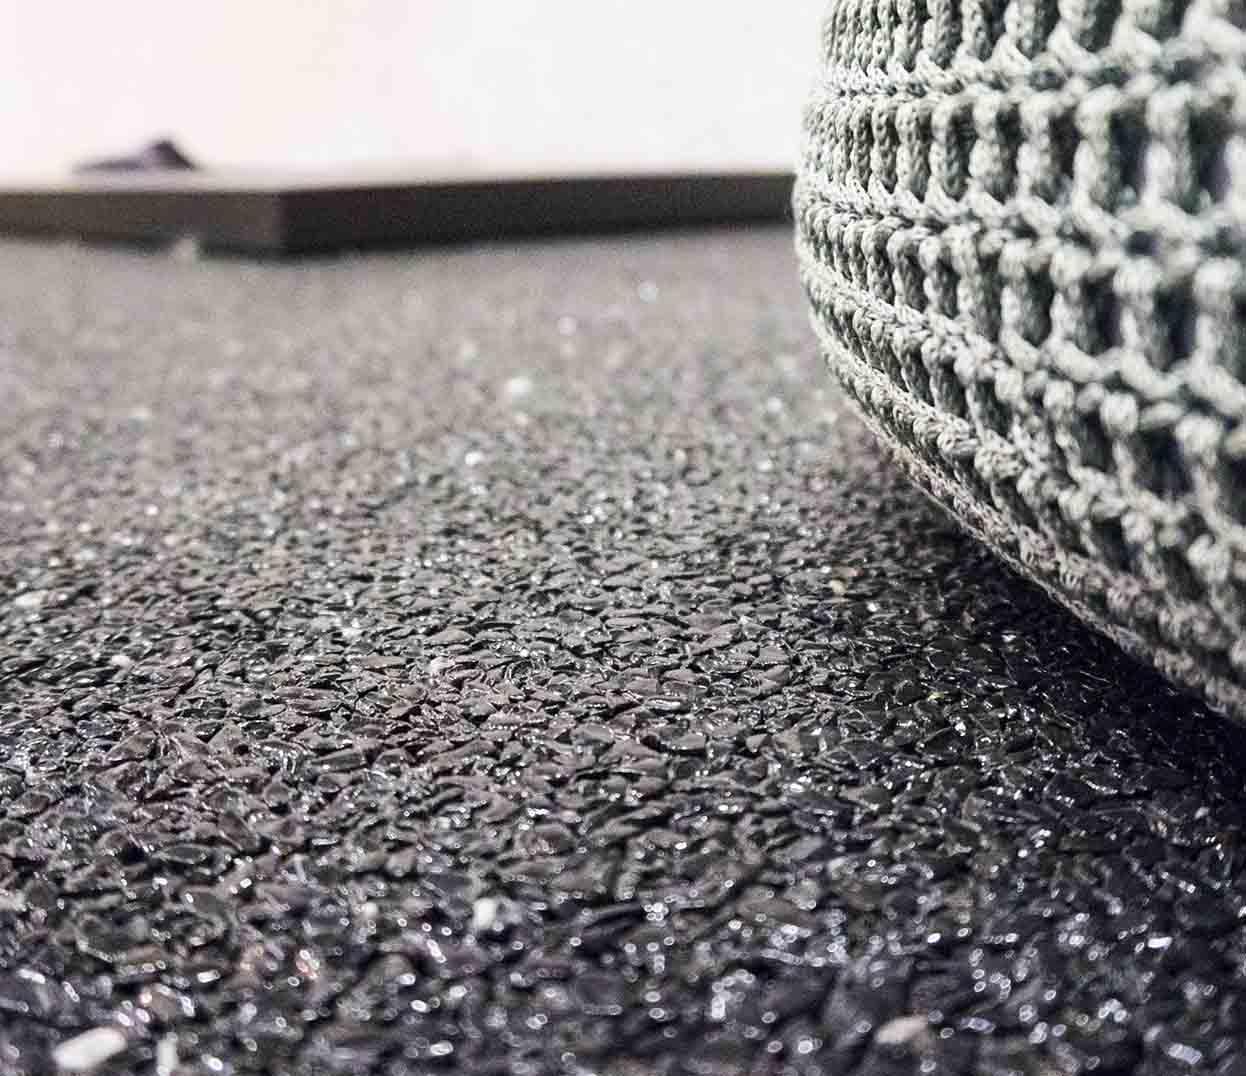 viarustik-stone-carpet 1